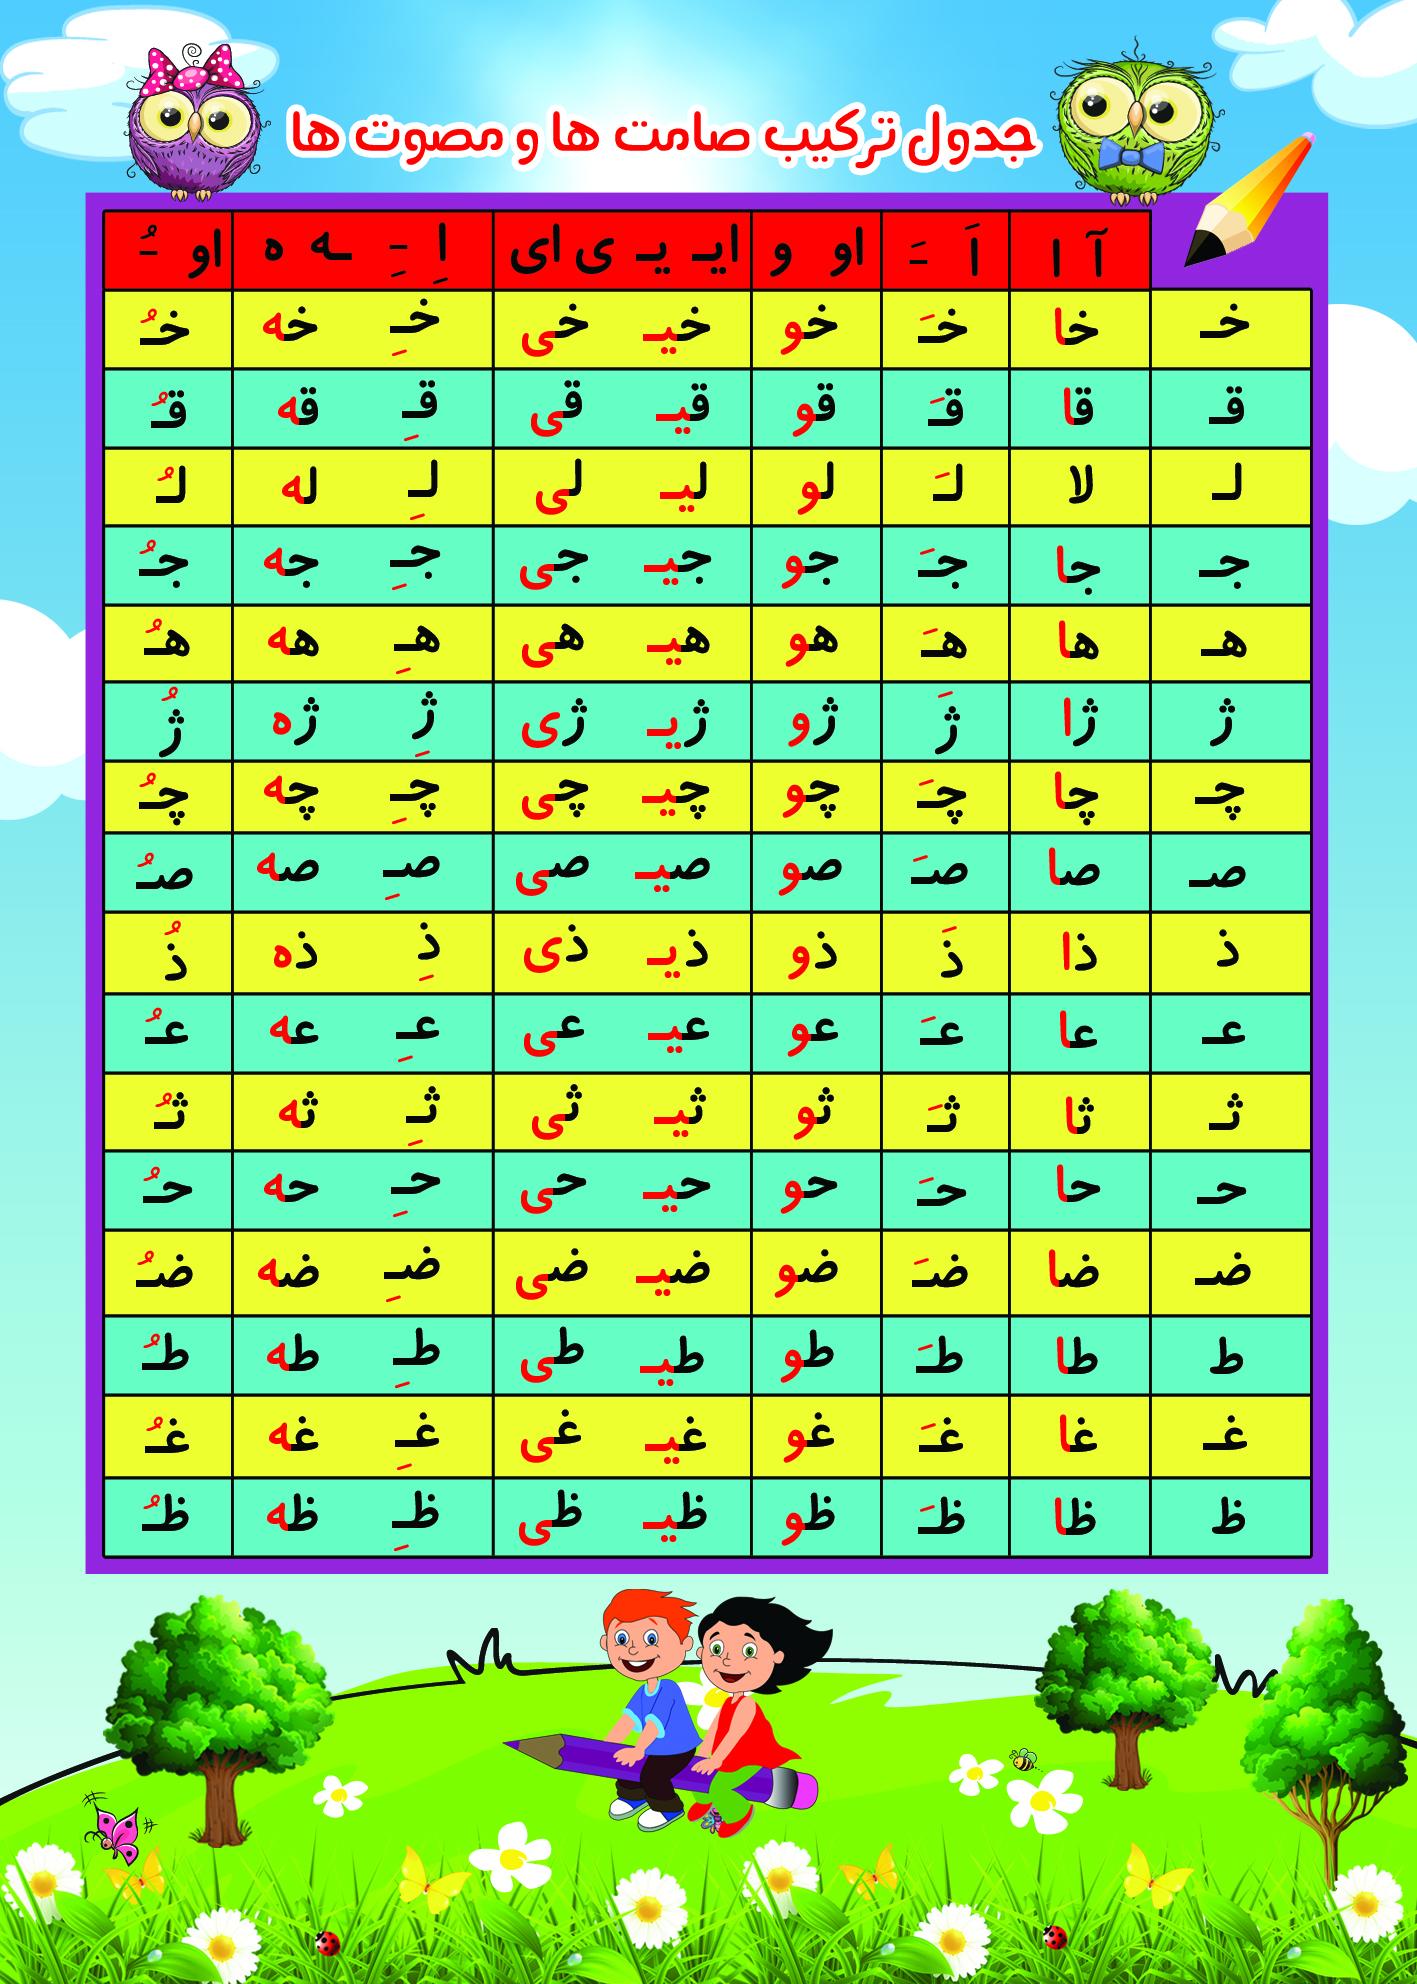 بنر ترکیب حروف الفبای فارسی